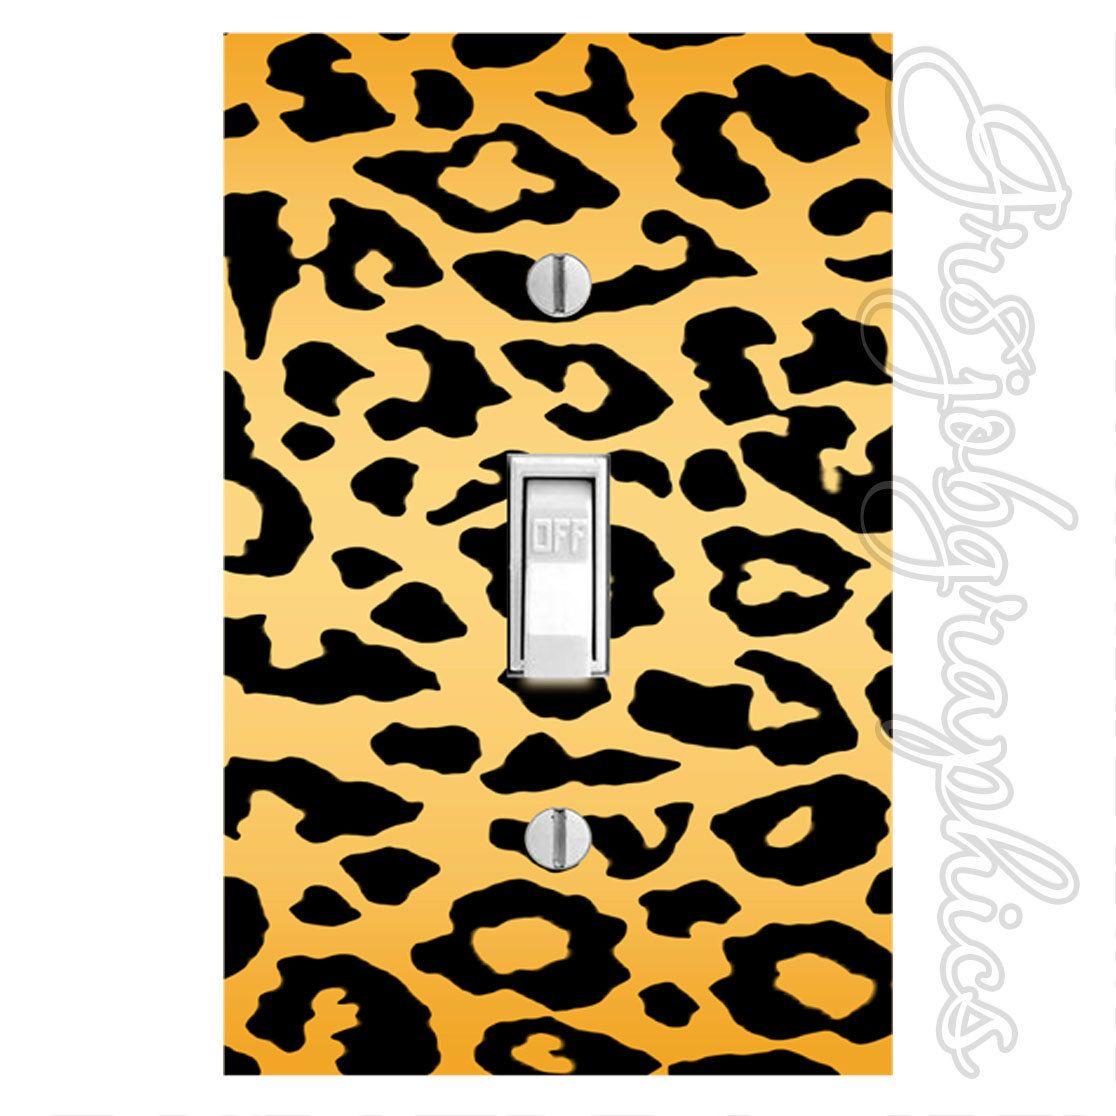 Light Switch Cover Decal Cheetah Print Leopard Spots Sticker Girls Room Ls16 Light Switch Covers Pink Leopard Print Wall Stickers [ 1116 x 1116 Pixel ]